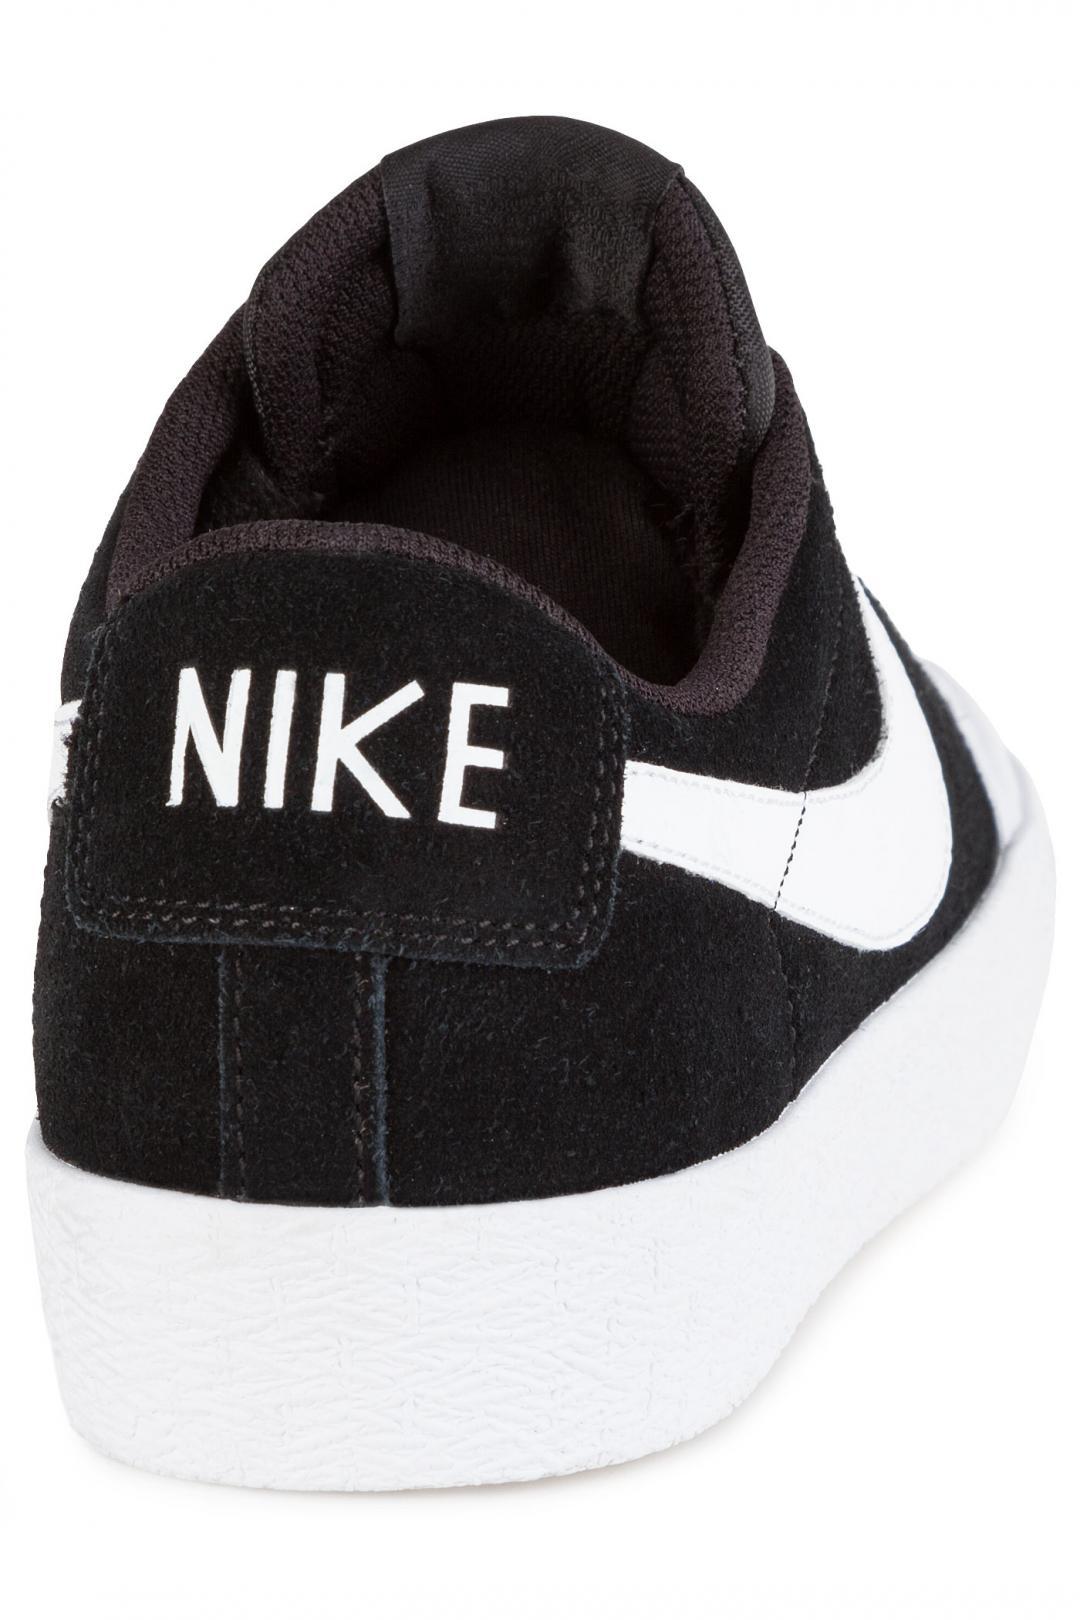 Uomo/Donna Nike SB Zoom Blazer Low XT black white   Scarpe da skate